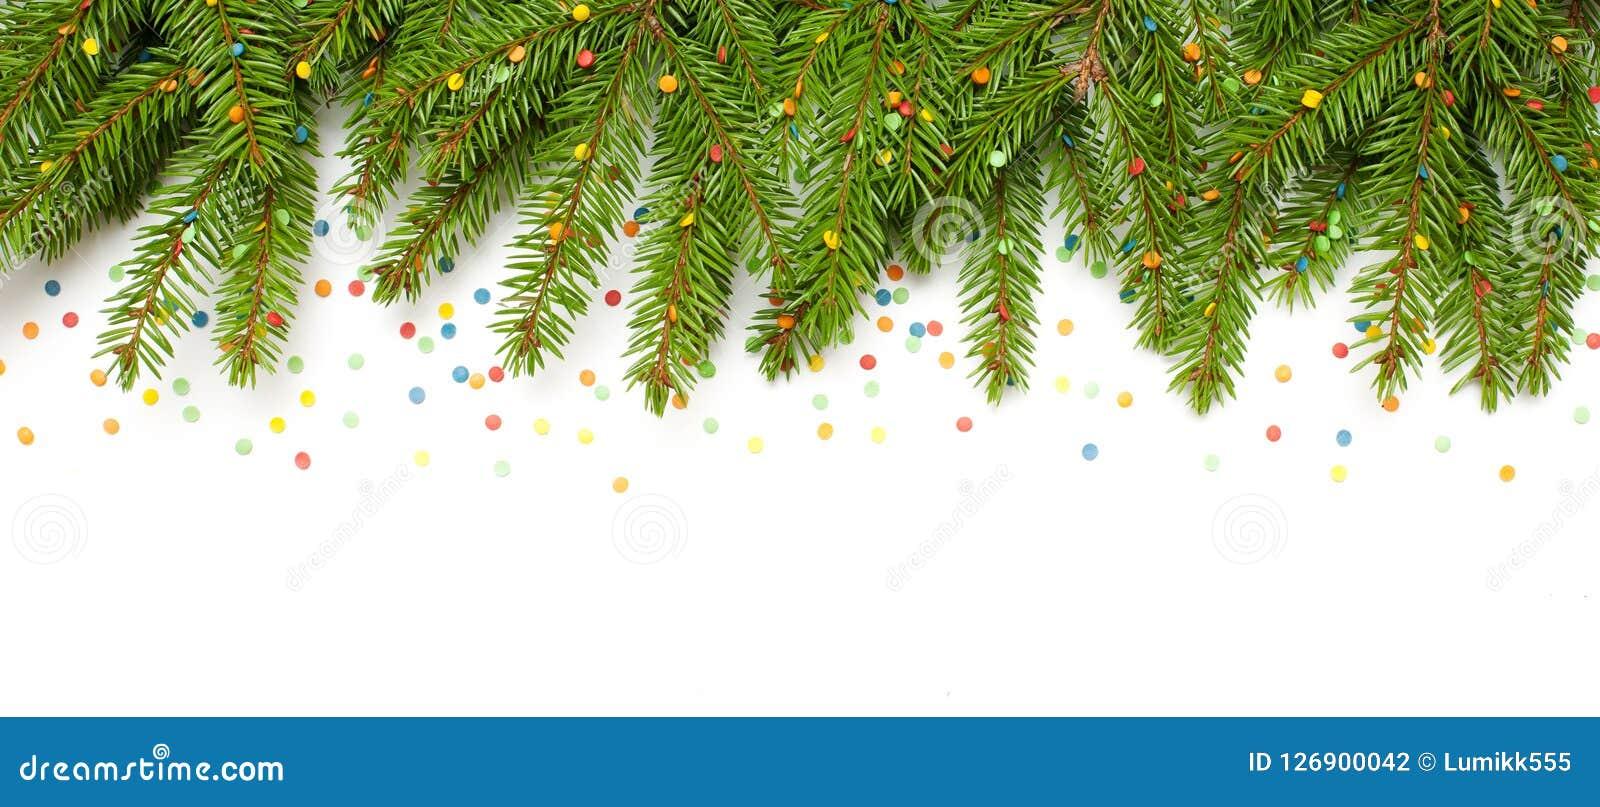 Beautiful Christmas Background Images.Beautiful Christmas Background With Green Fir Tree Branches